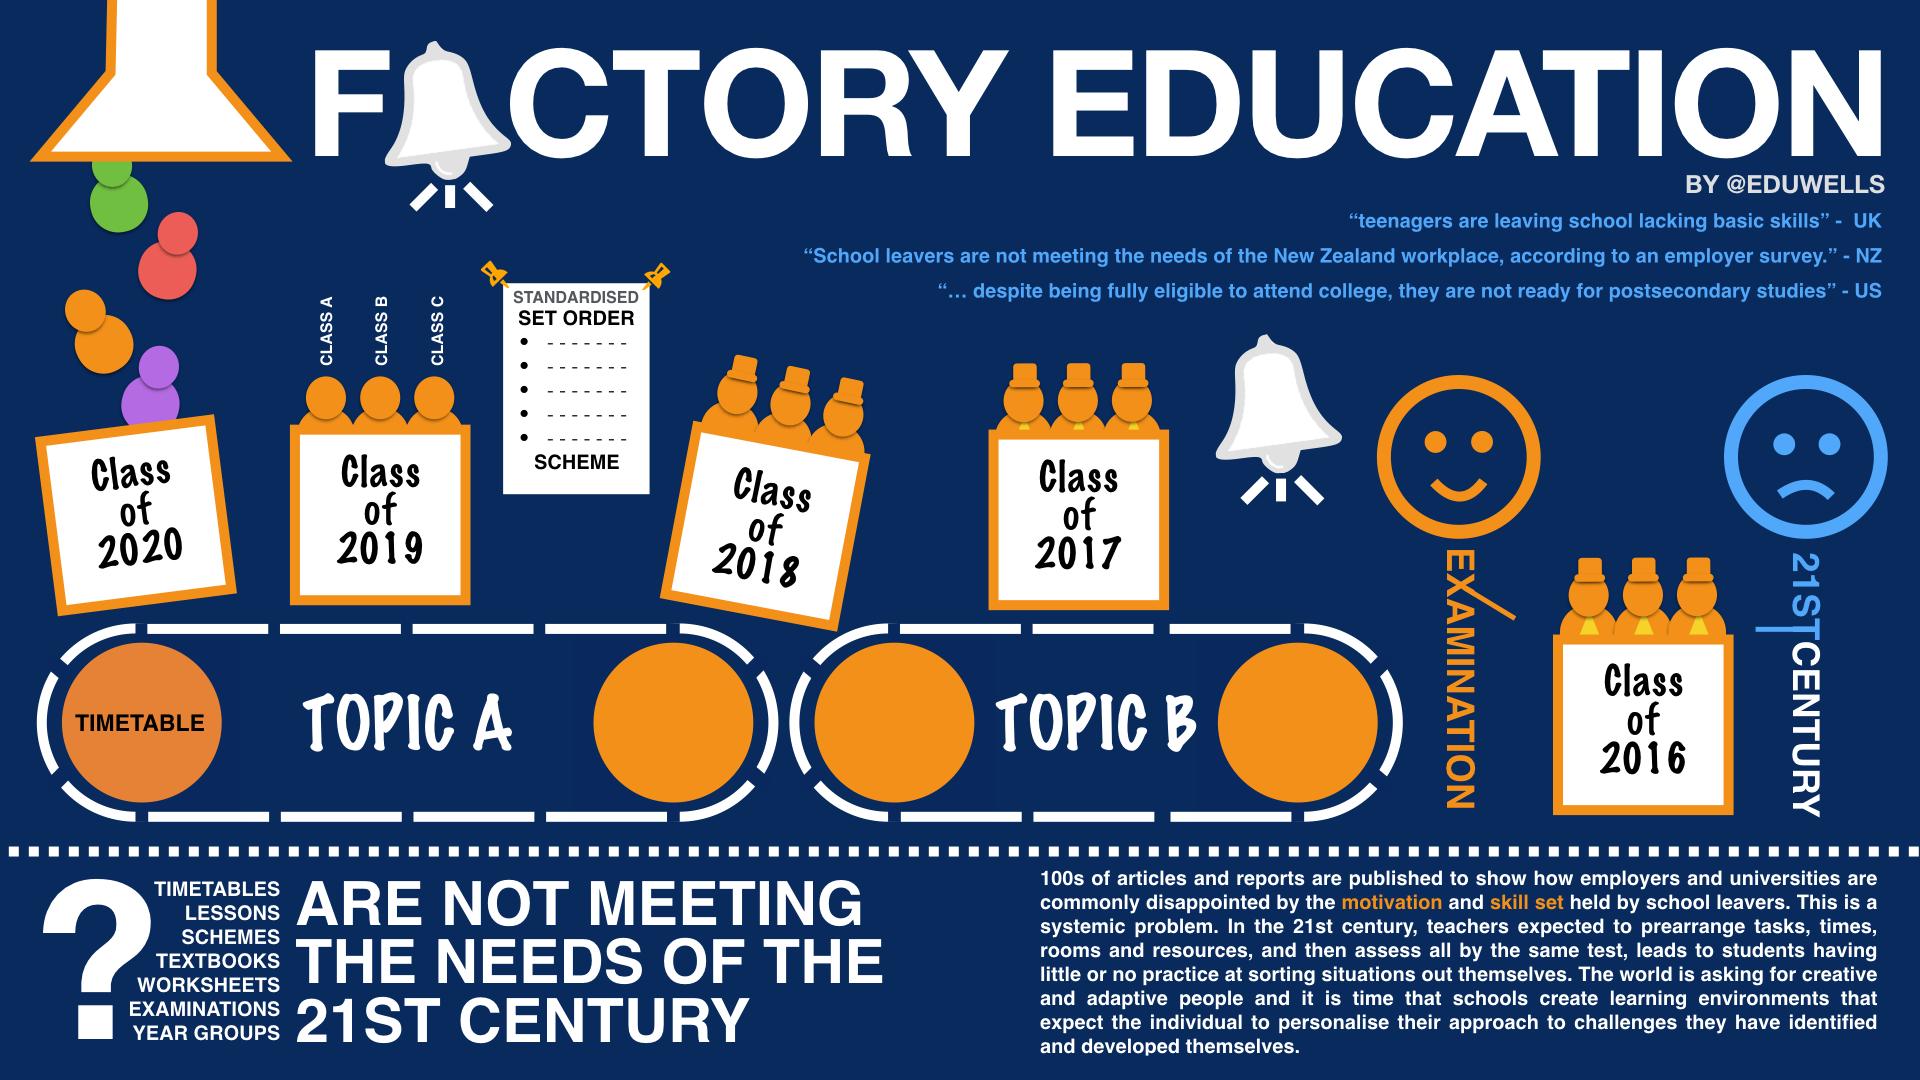 Graphic from www.eduwells.com